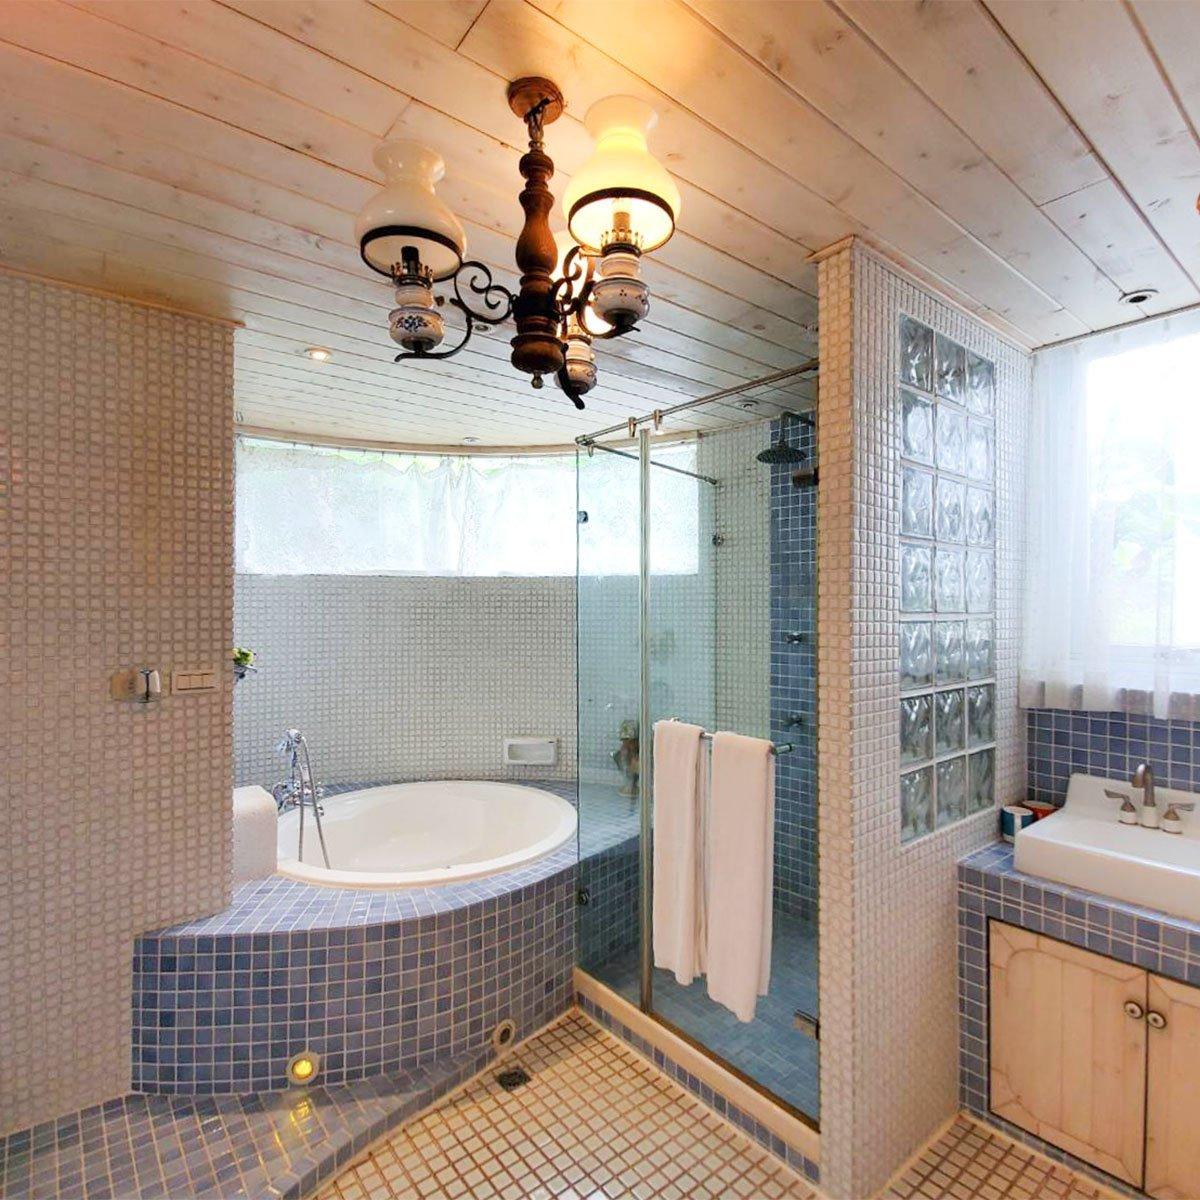 bathtub and tank